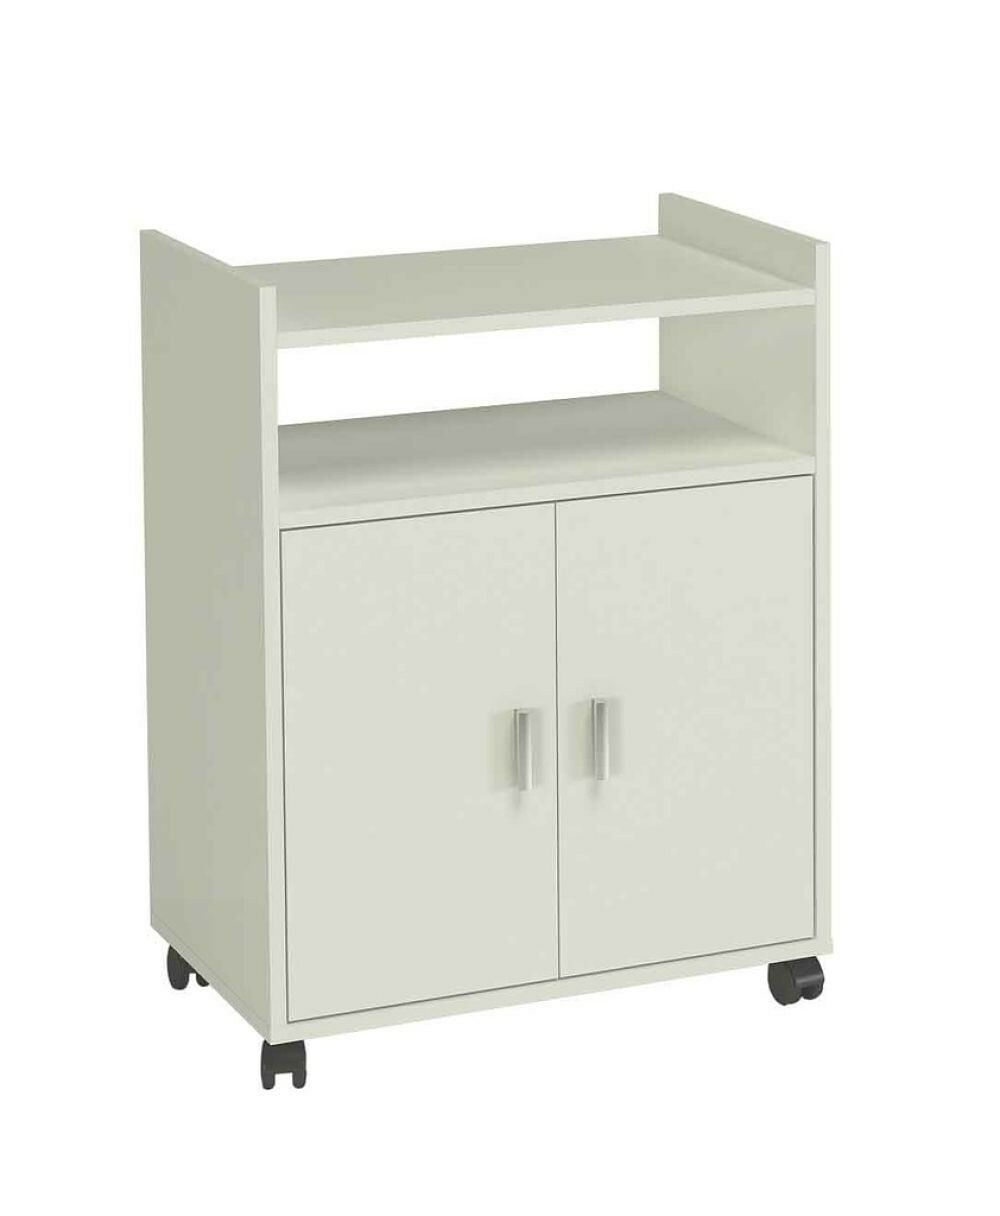 Hogar24 mueble armario auxiliar de cocina para microondas color blanco ebay - Armarios auxiliares para cocina ...